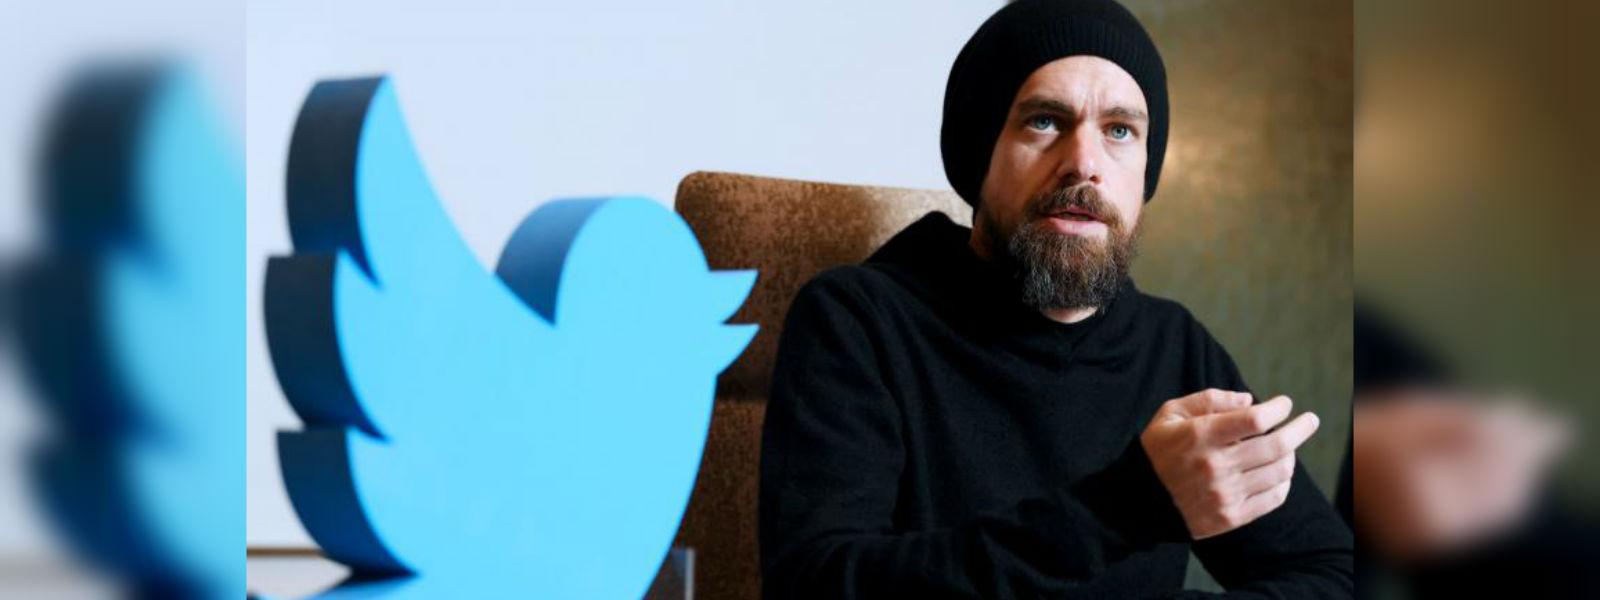 Twitter chief Jack Dorsey lends a hand to UK refugee entrepreneurs